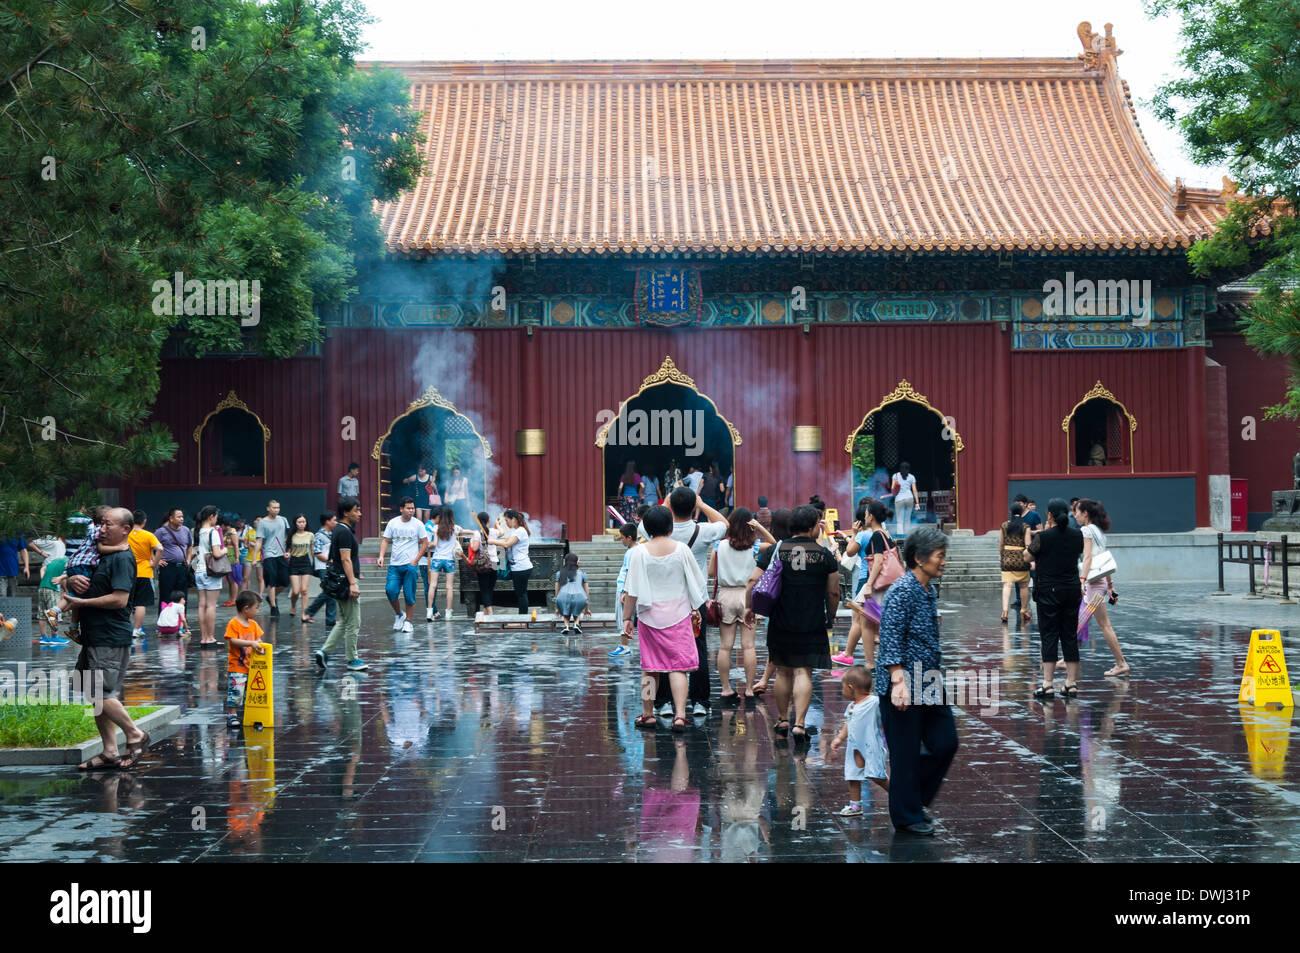 La arquitectura tradicional china en el Templo Lama Yonghegong de Beijing, China. Foto de stock